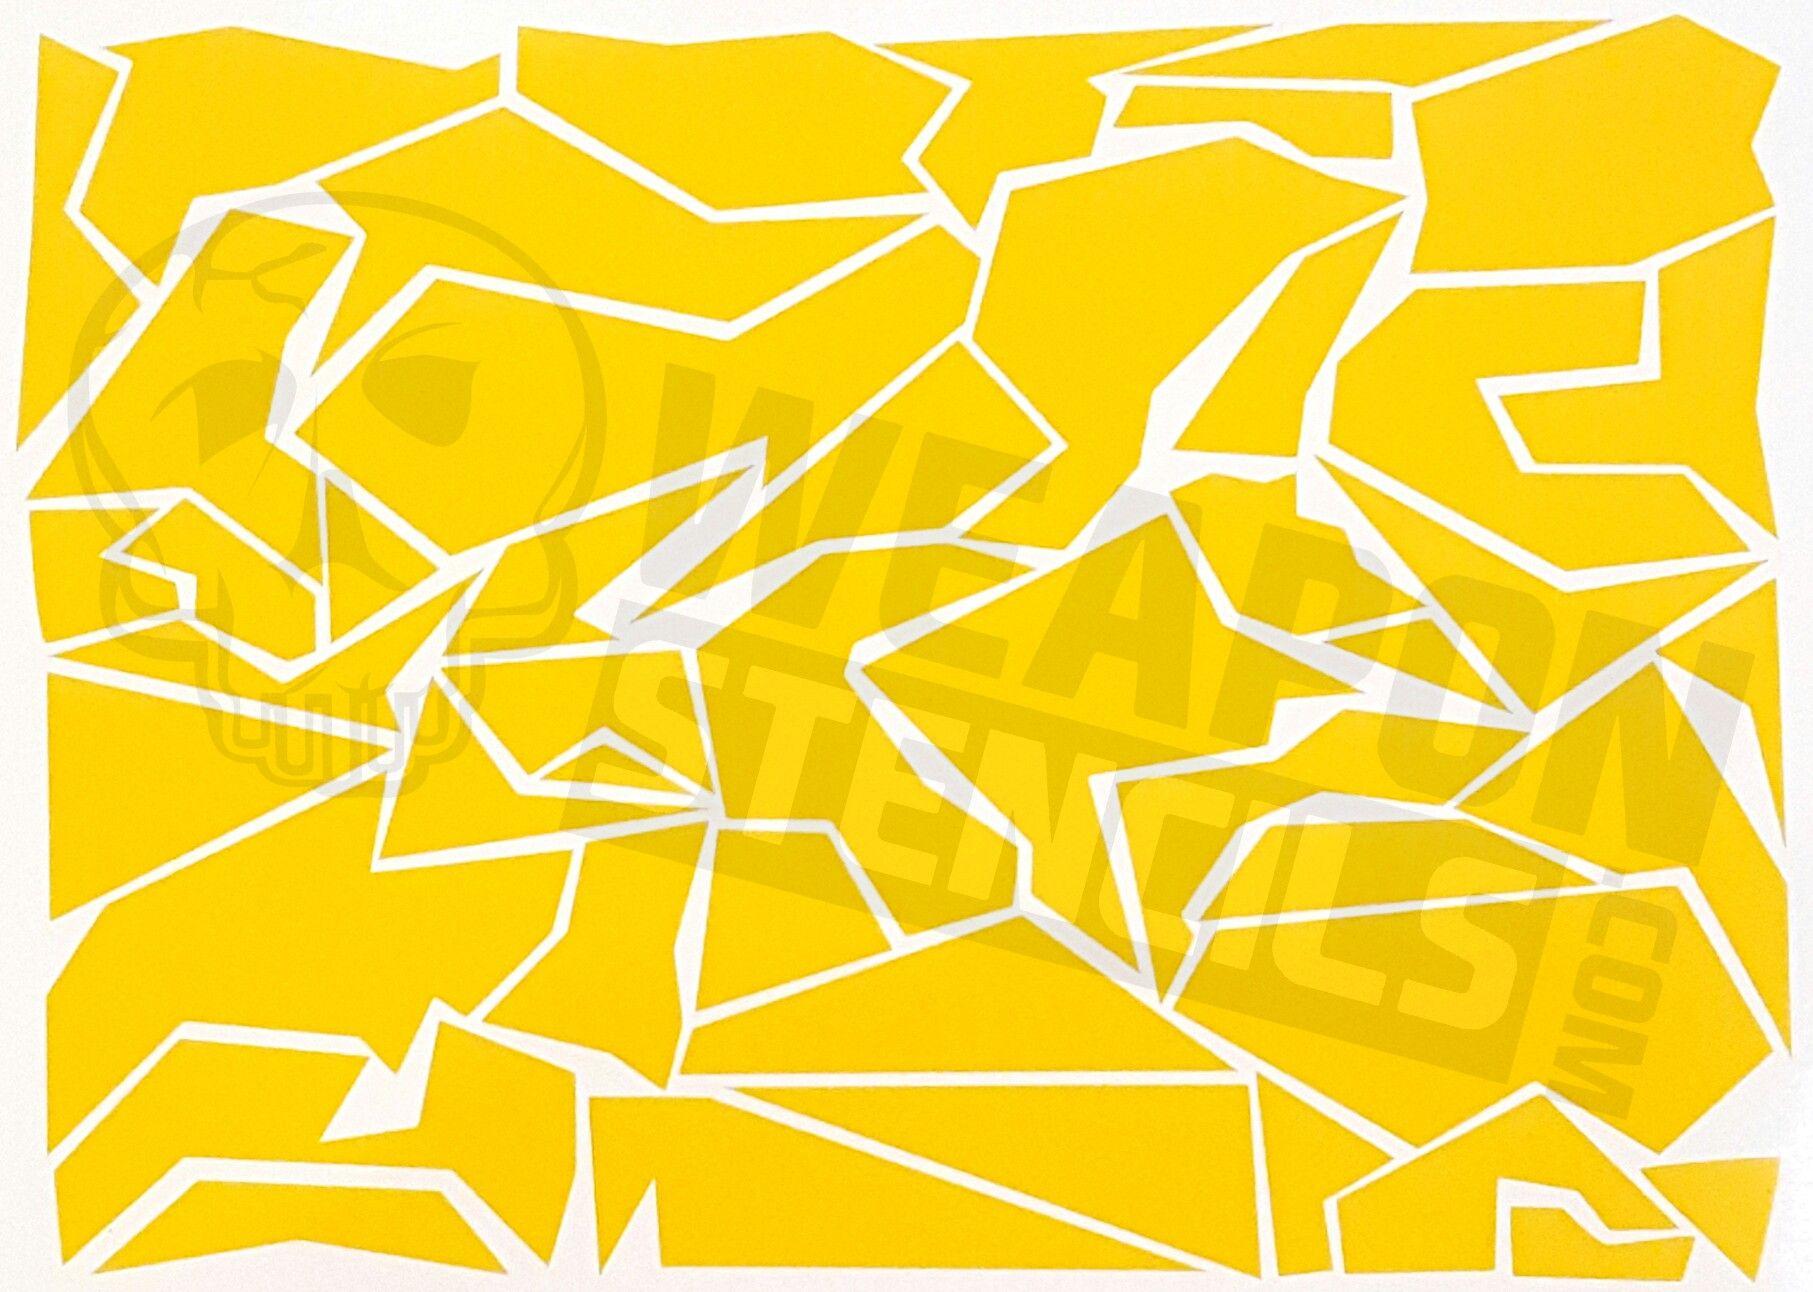 Splinter Camo | Camo Ideas | Camo Stencil, Adhesive Stencils, Stencils - Free Printable Camo Stencils